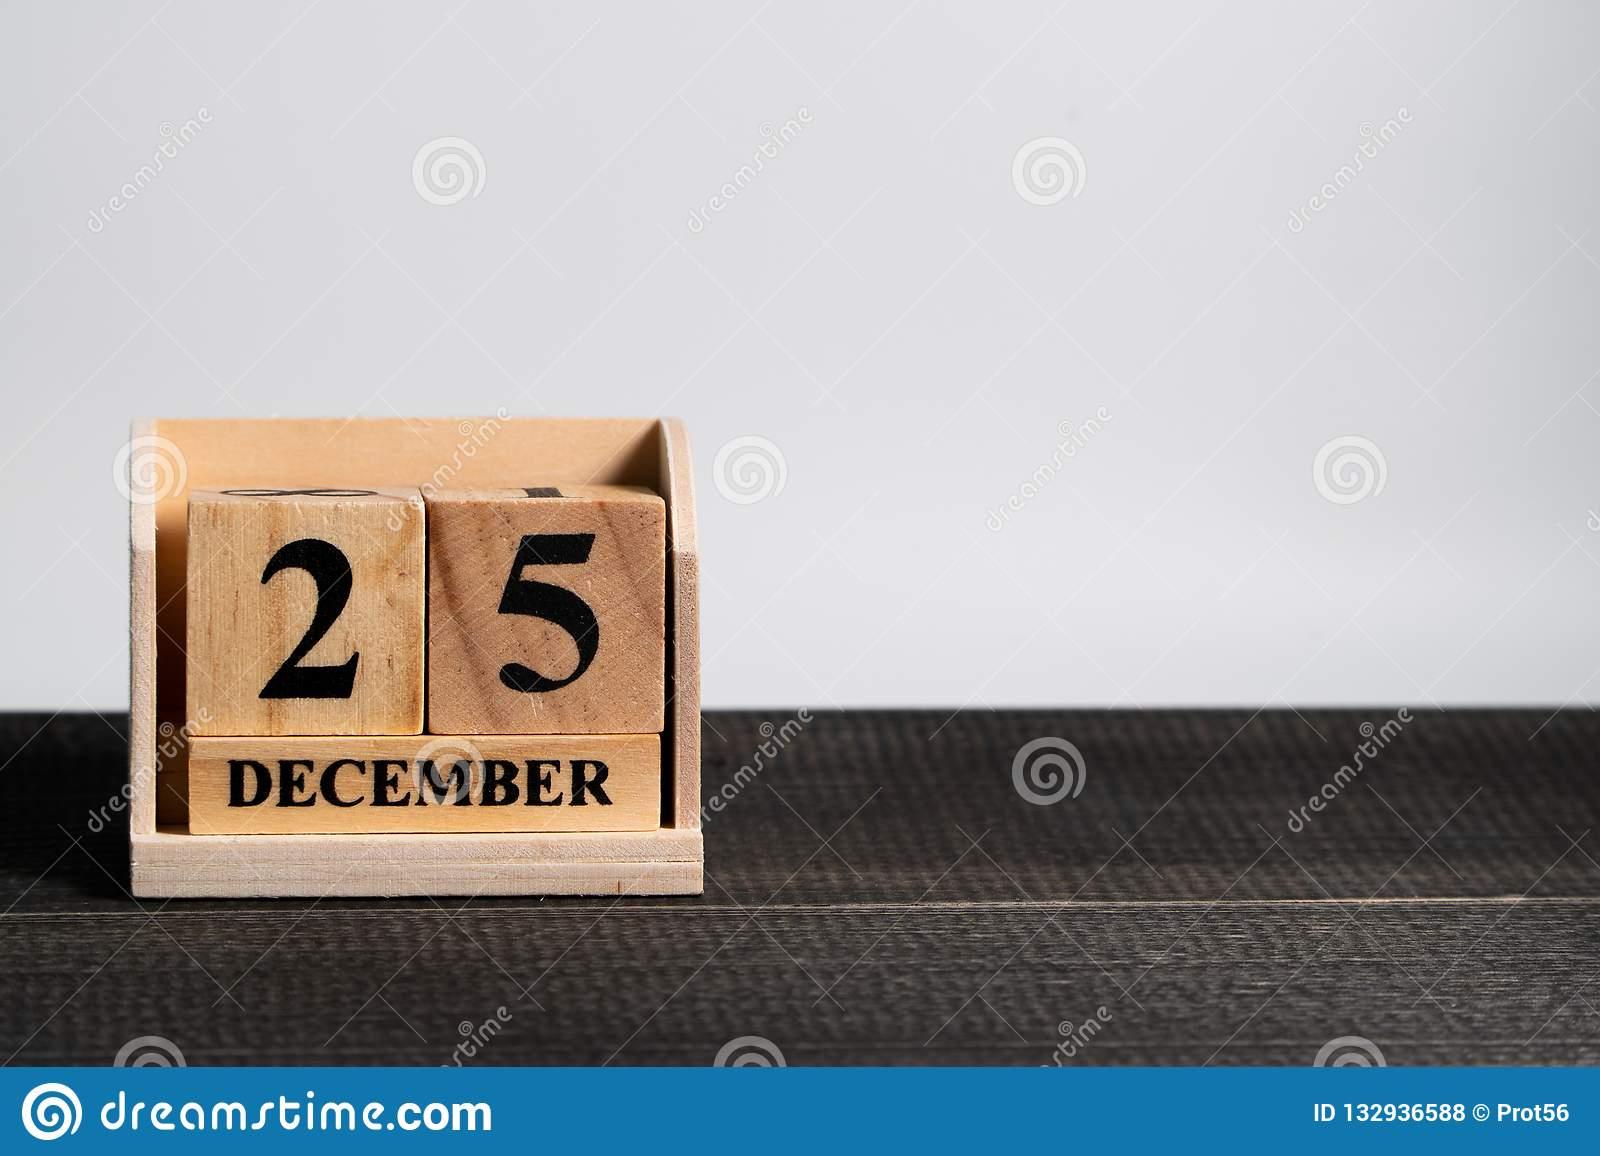 Wooden Block Calendar Set On The Christmas Date 25